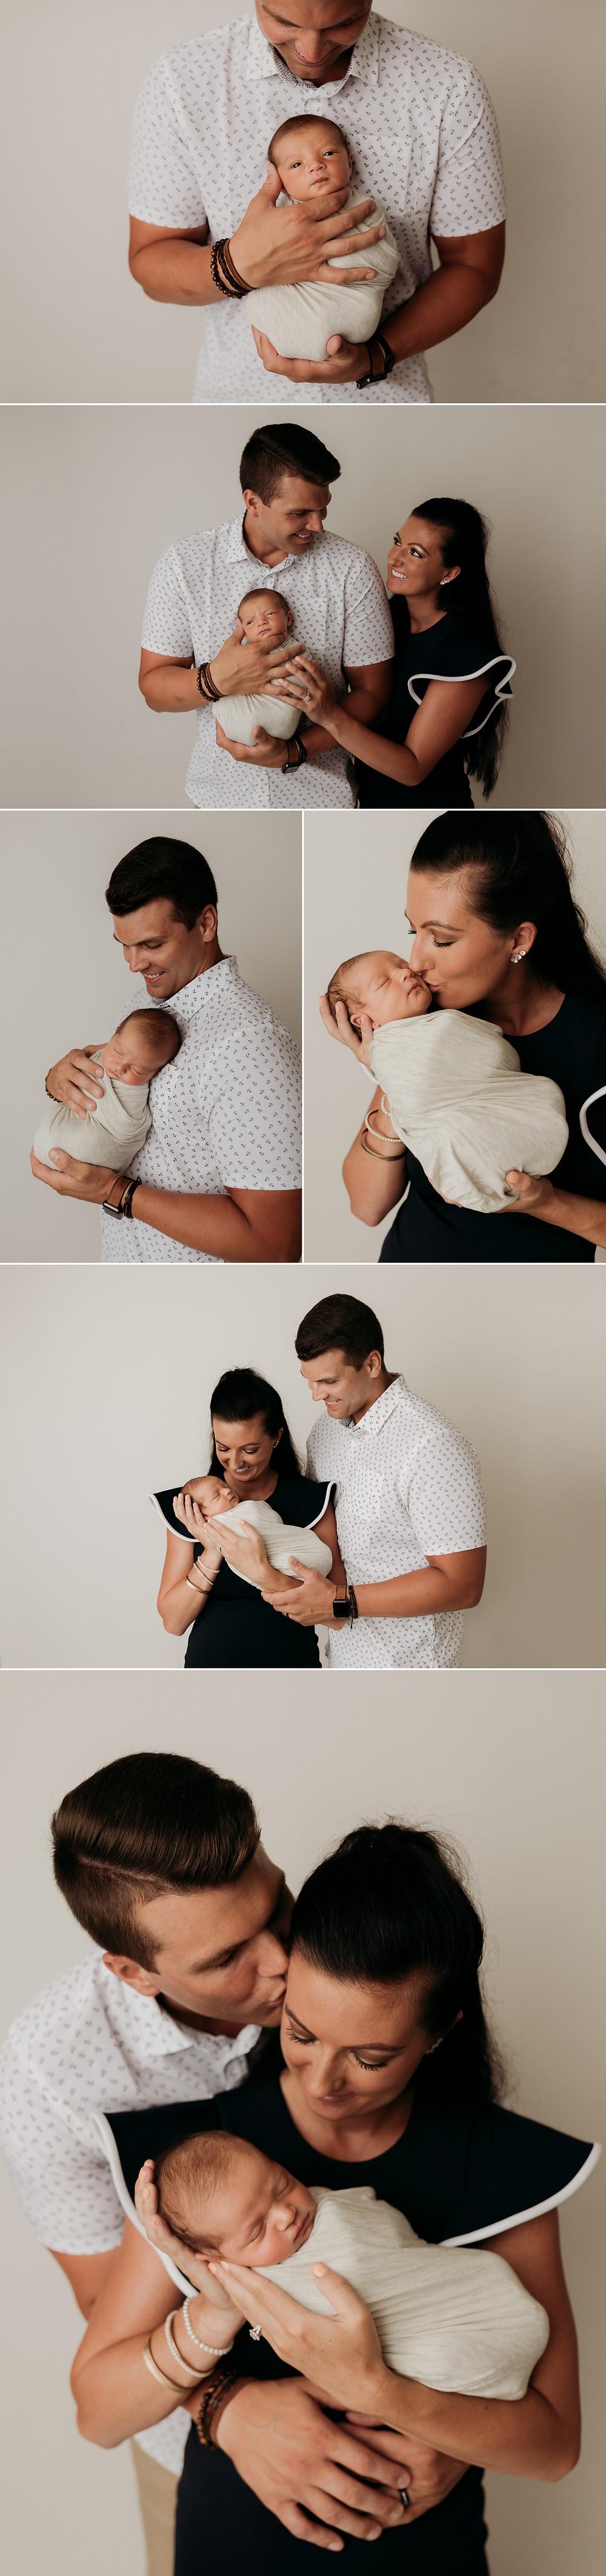 family photos with newborn